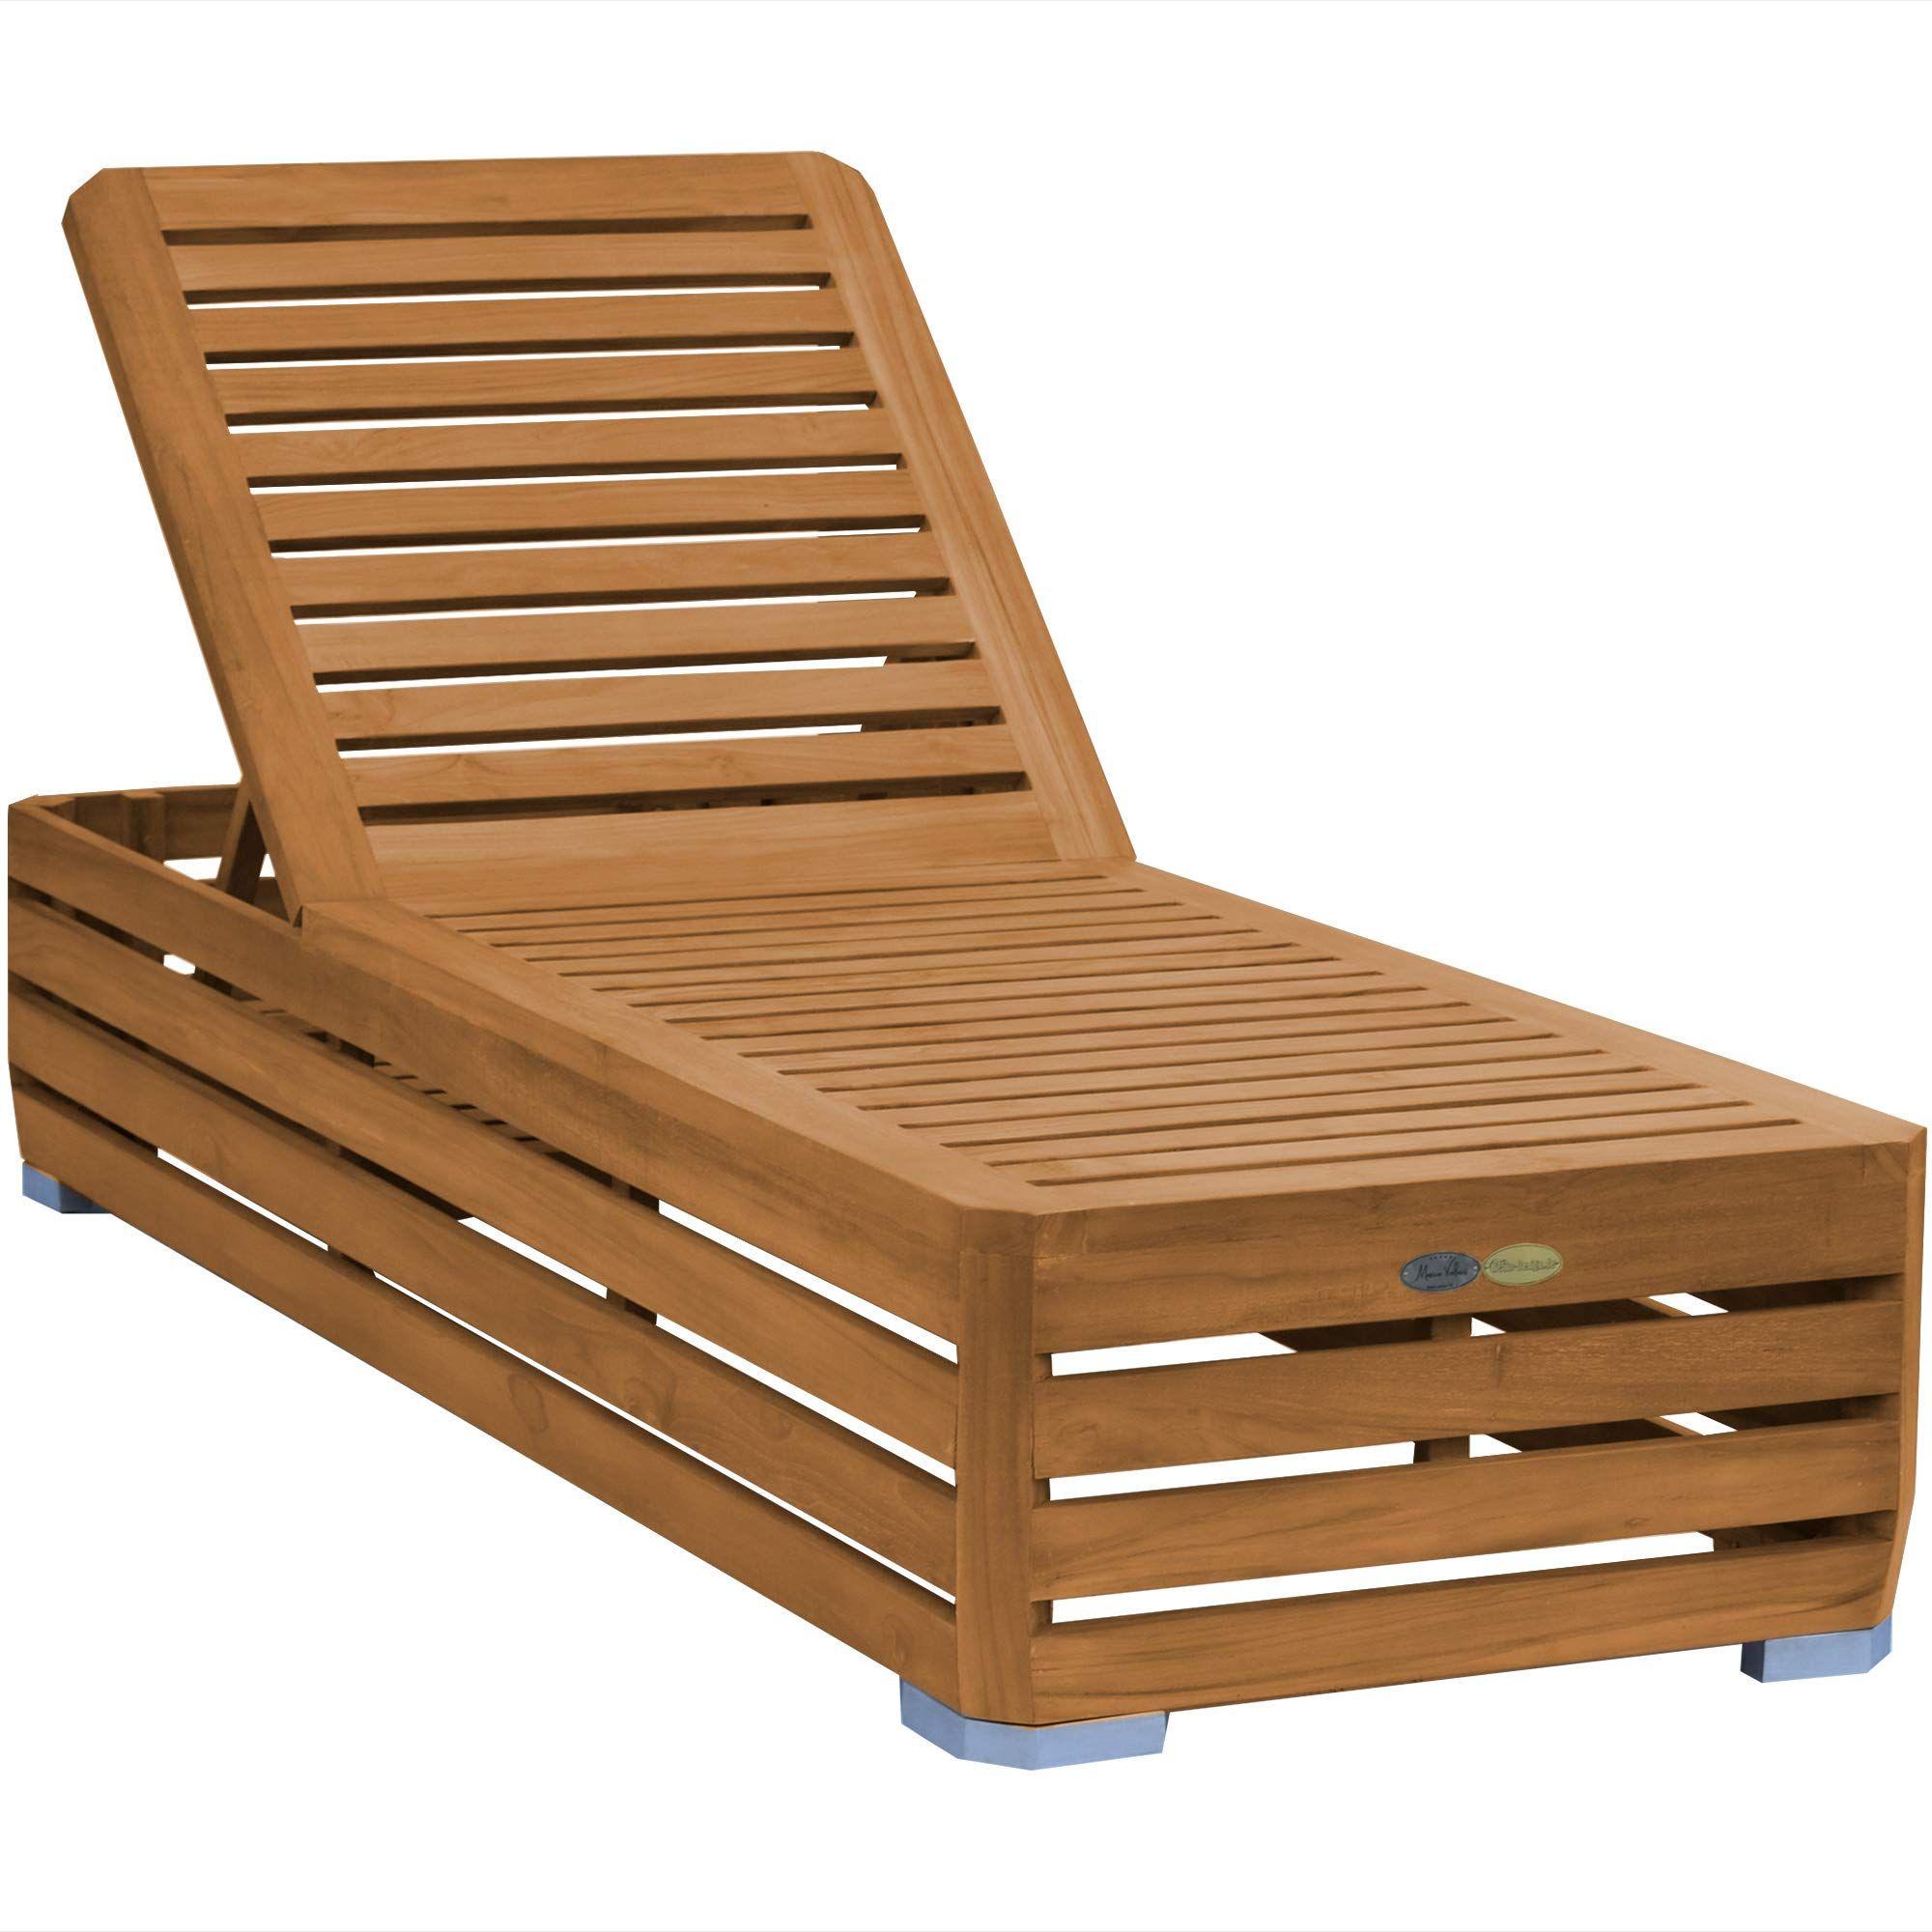 Teako Design Gartenliege Picardie Teak Unbehandeltes Massivholz Wetterfest Sonnenliege Teakholz Holzliege Relaxliege Amazon De Holzliege Relaxliege Teak Holz